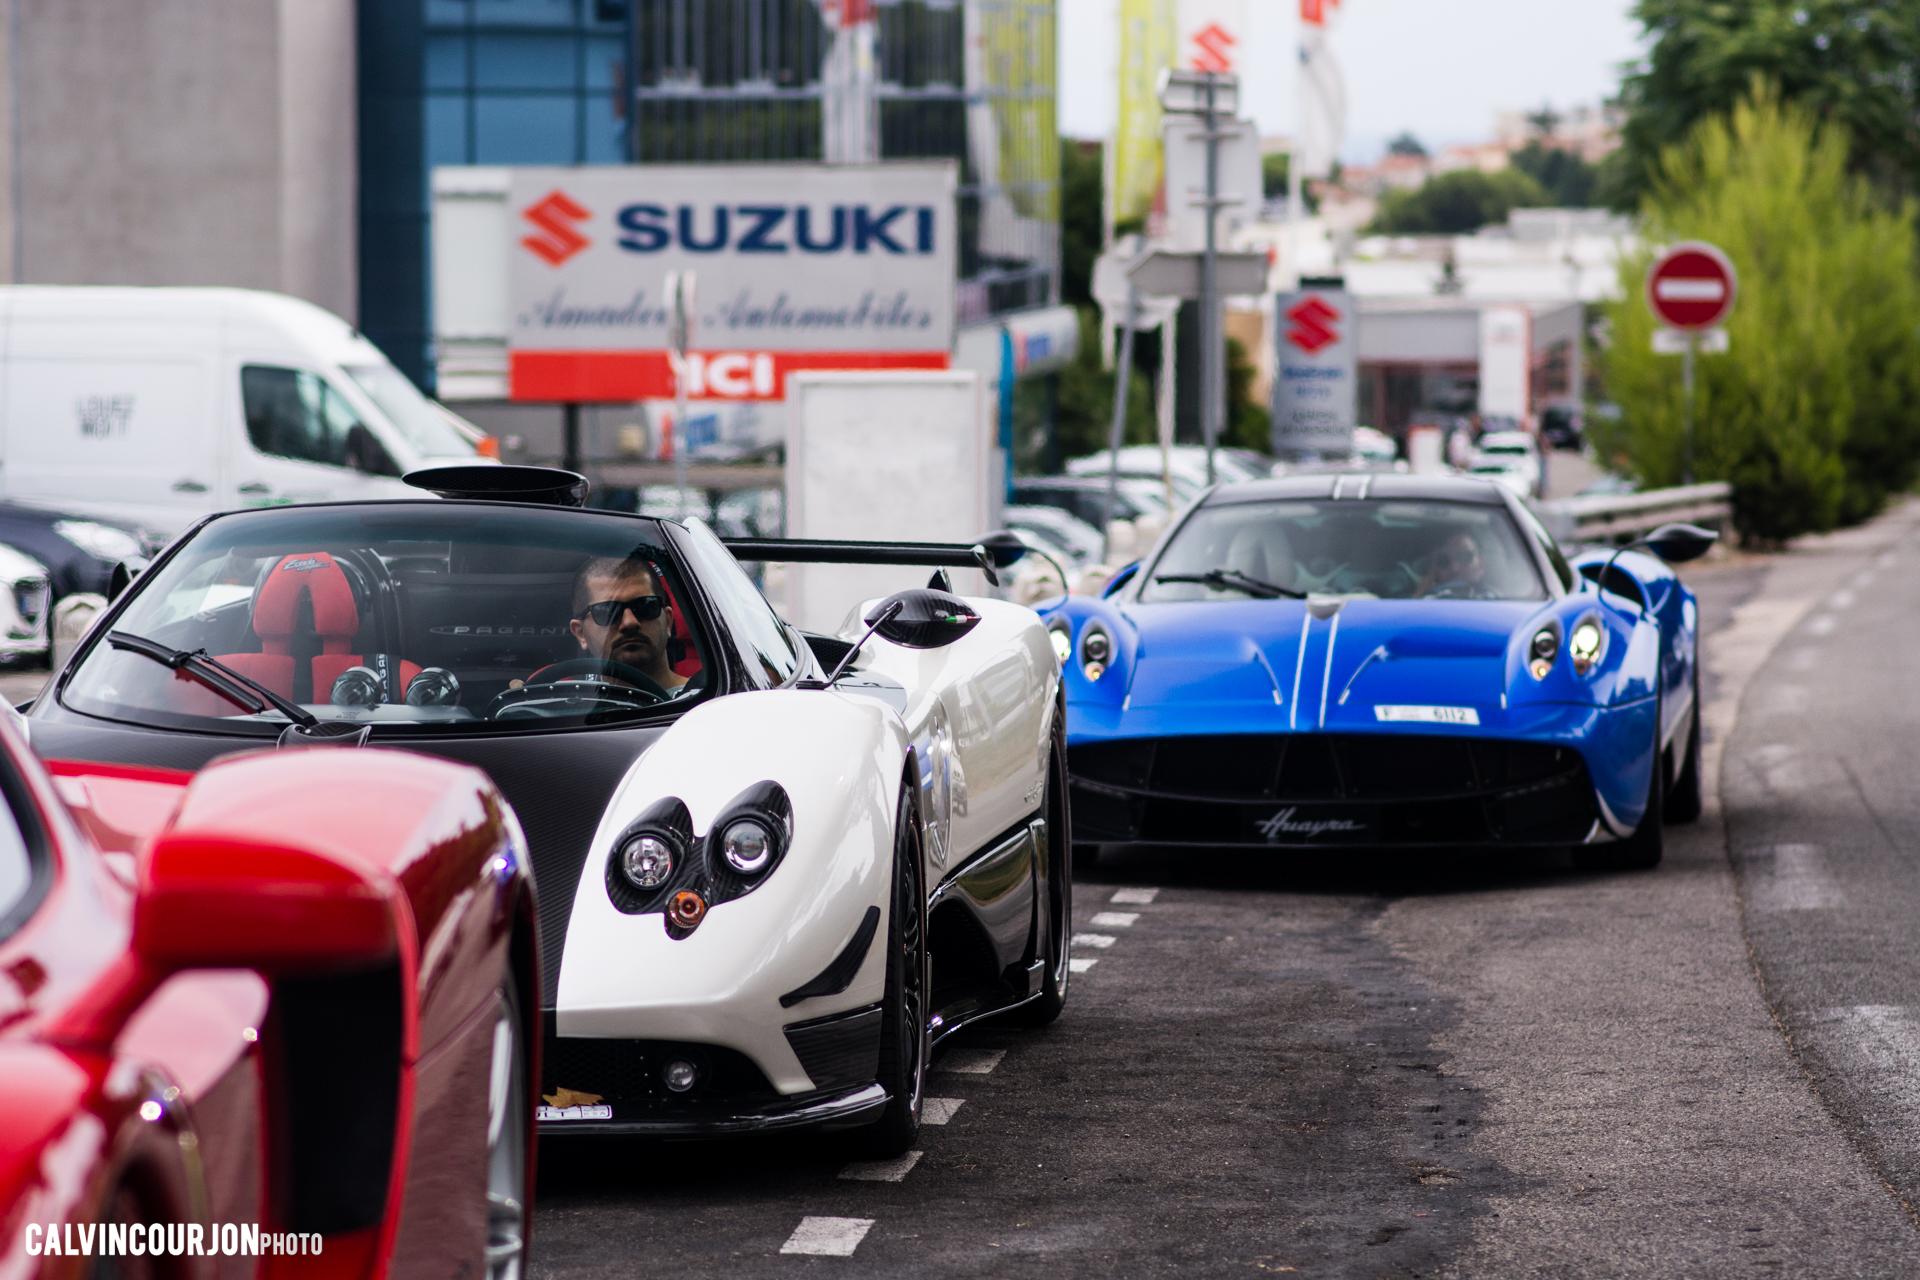 Pagani et Ferrari hypercars - en ville - Cote dAzur - 2015 - Calvin Courjon